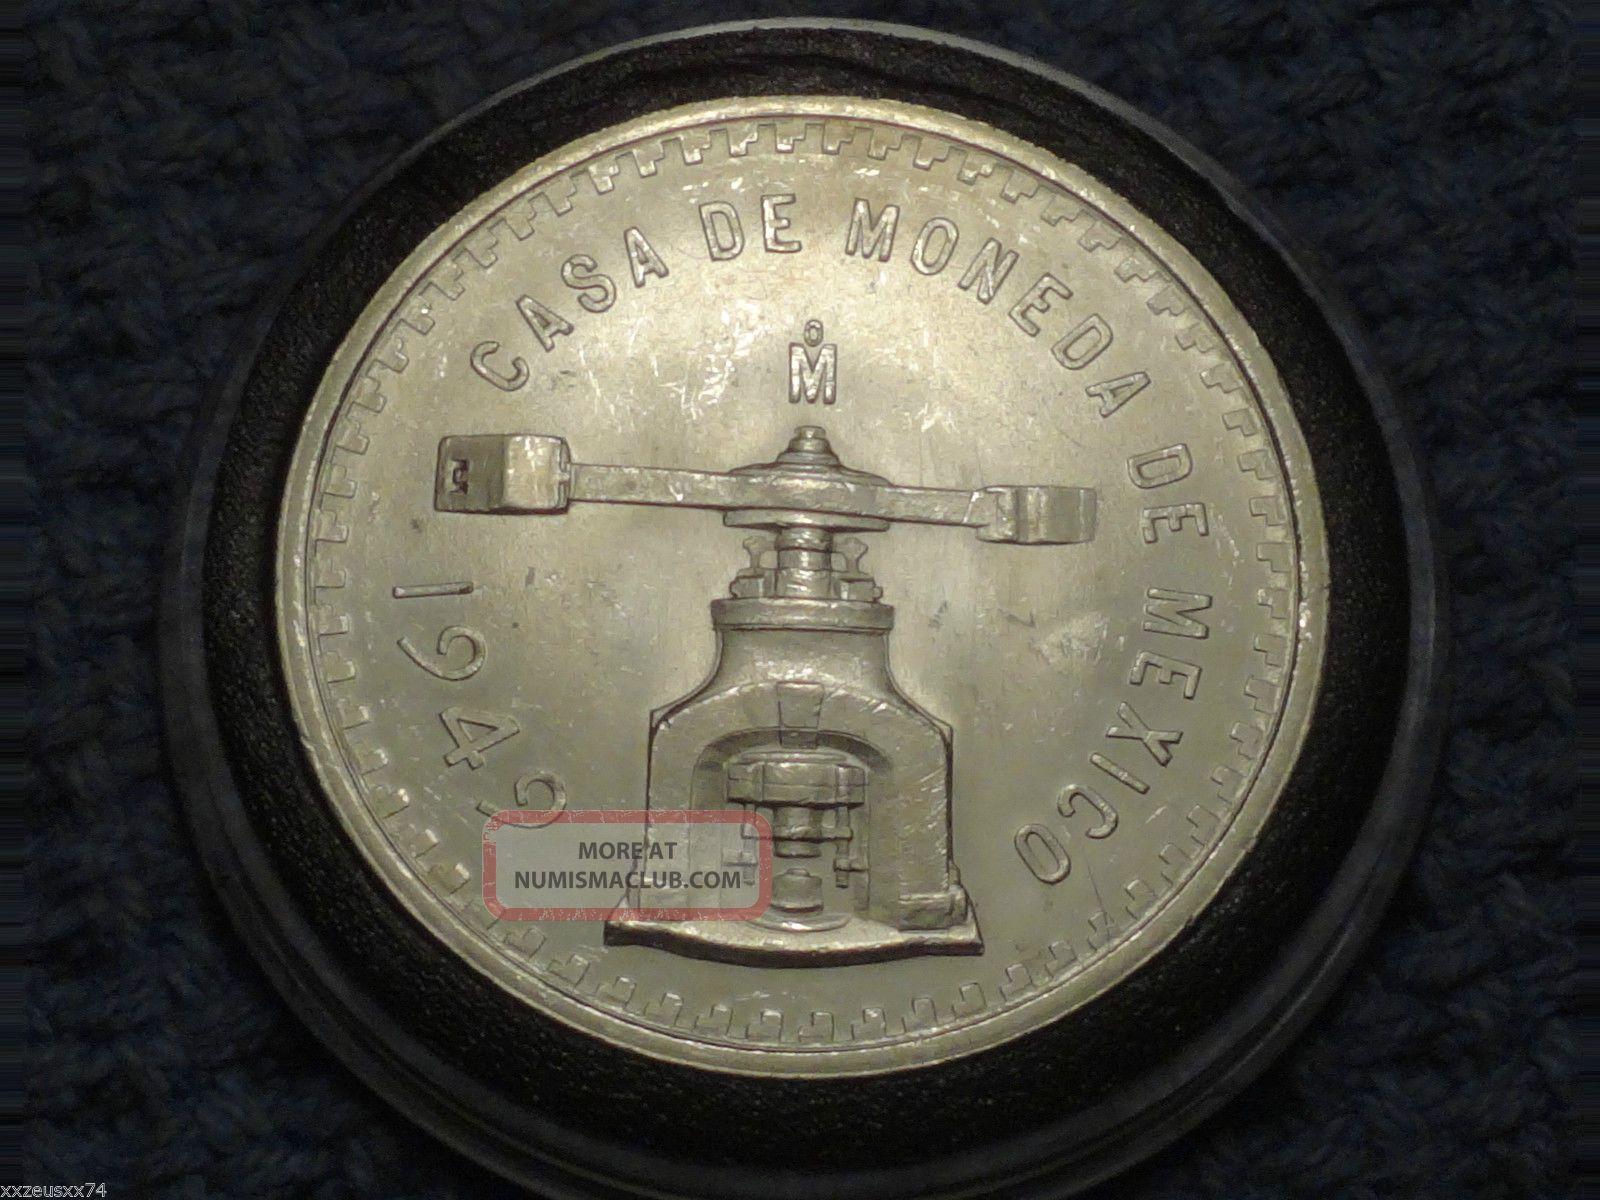 1949 Mo - Mexico Silver Onza Bullion Coin - Unc - Coin Press - 1 Troy